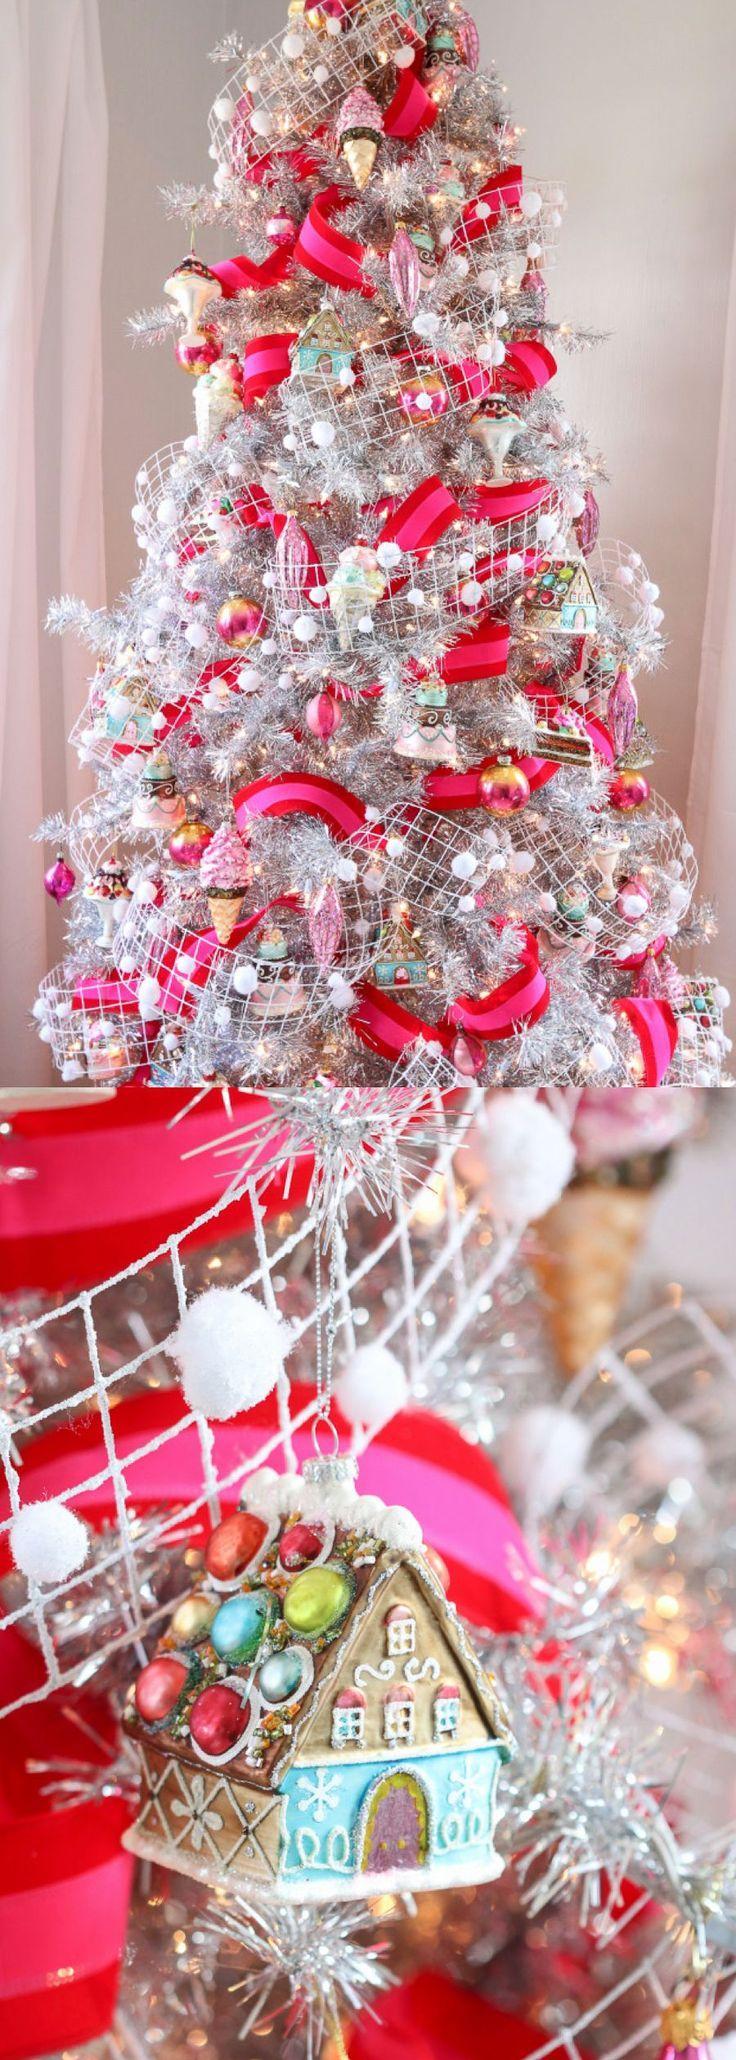 Unique christmas tree decorations ideas - Pink And Silver Christmas Tree Unique Christmas Tree Decorating Ideas